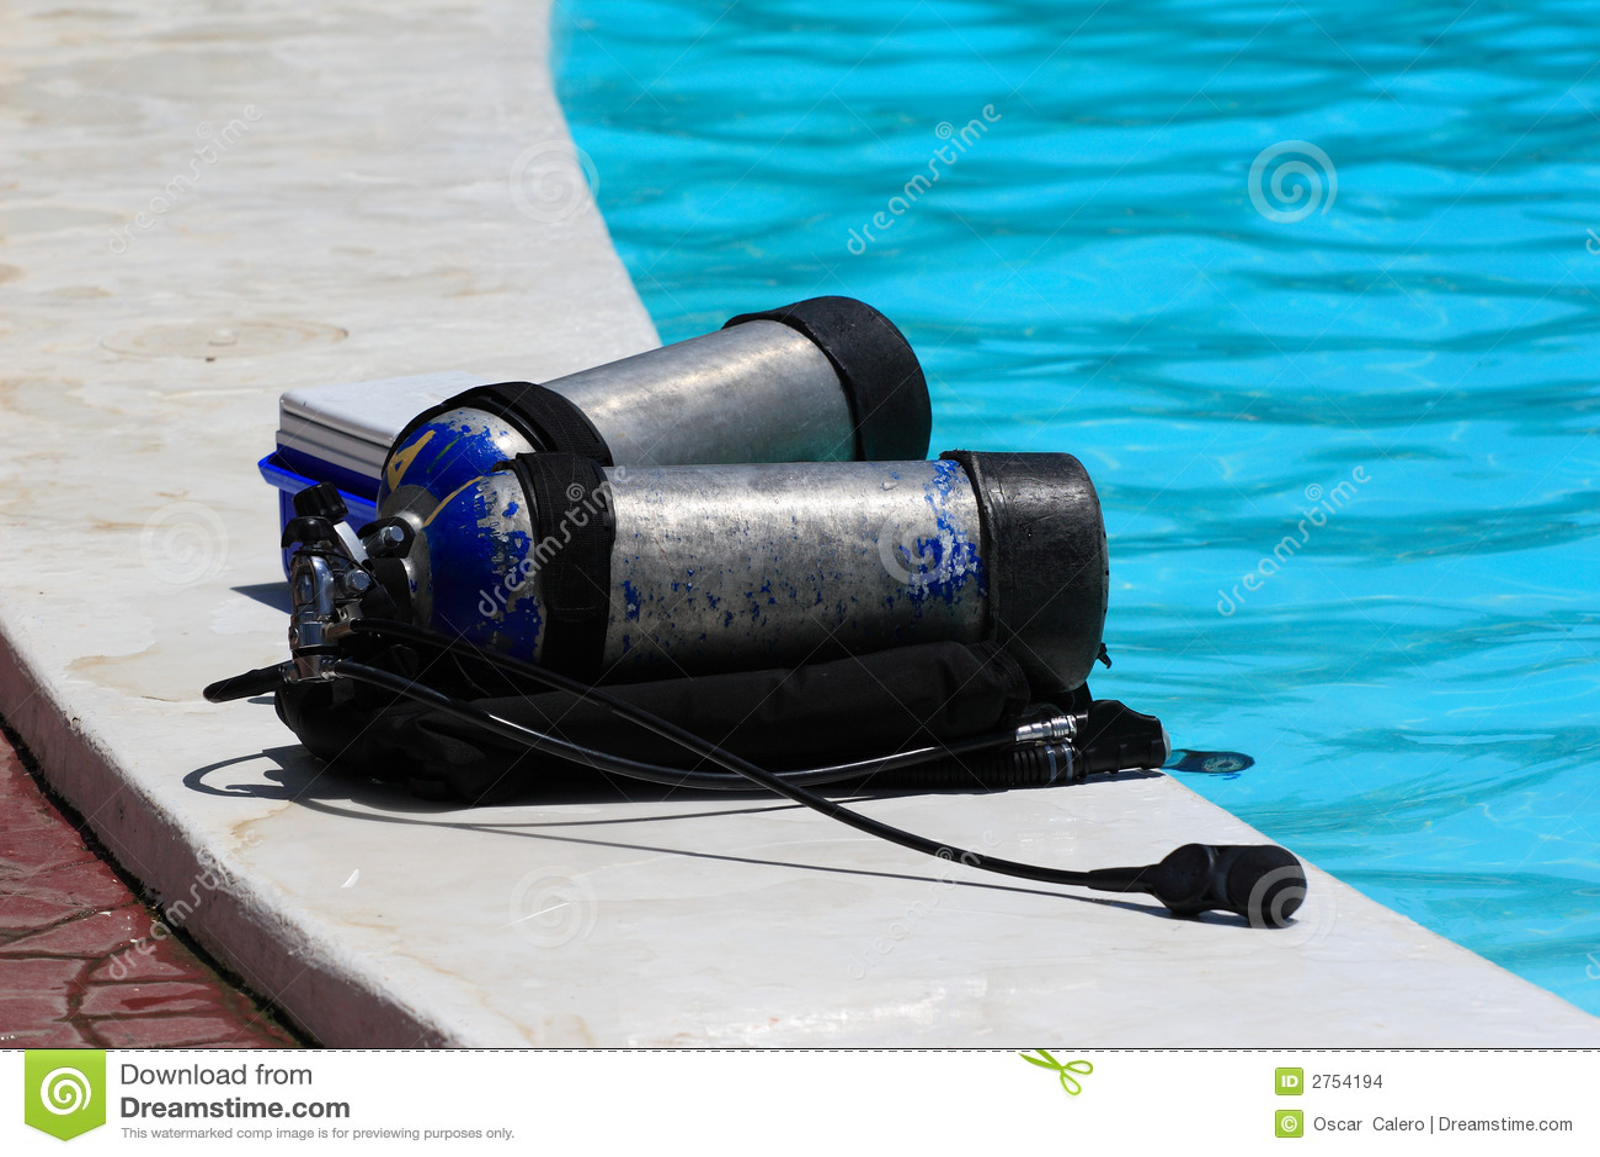 A description of the dangers and rewards of scuba diving